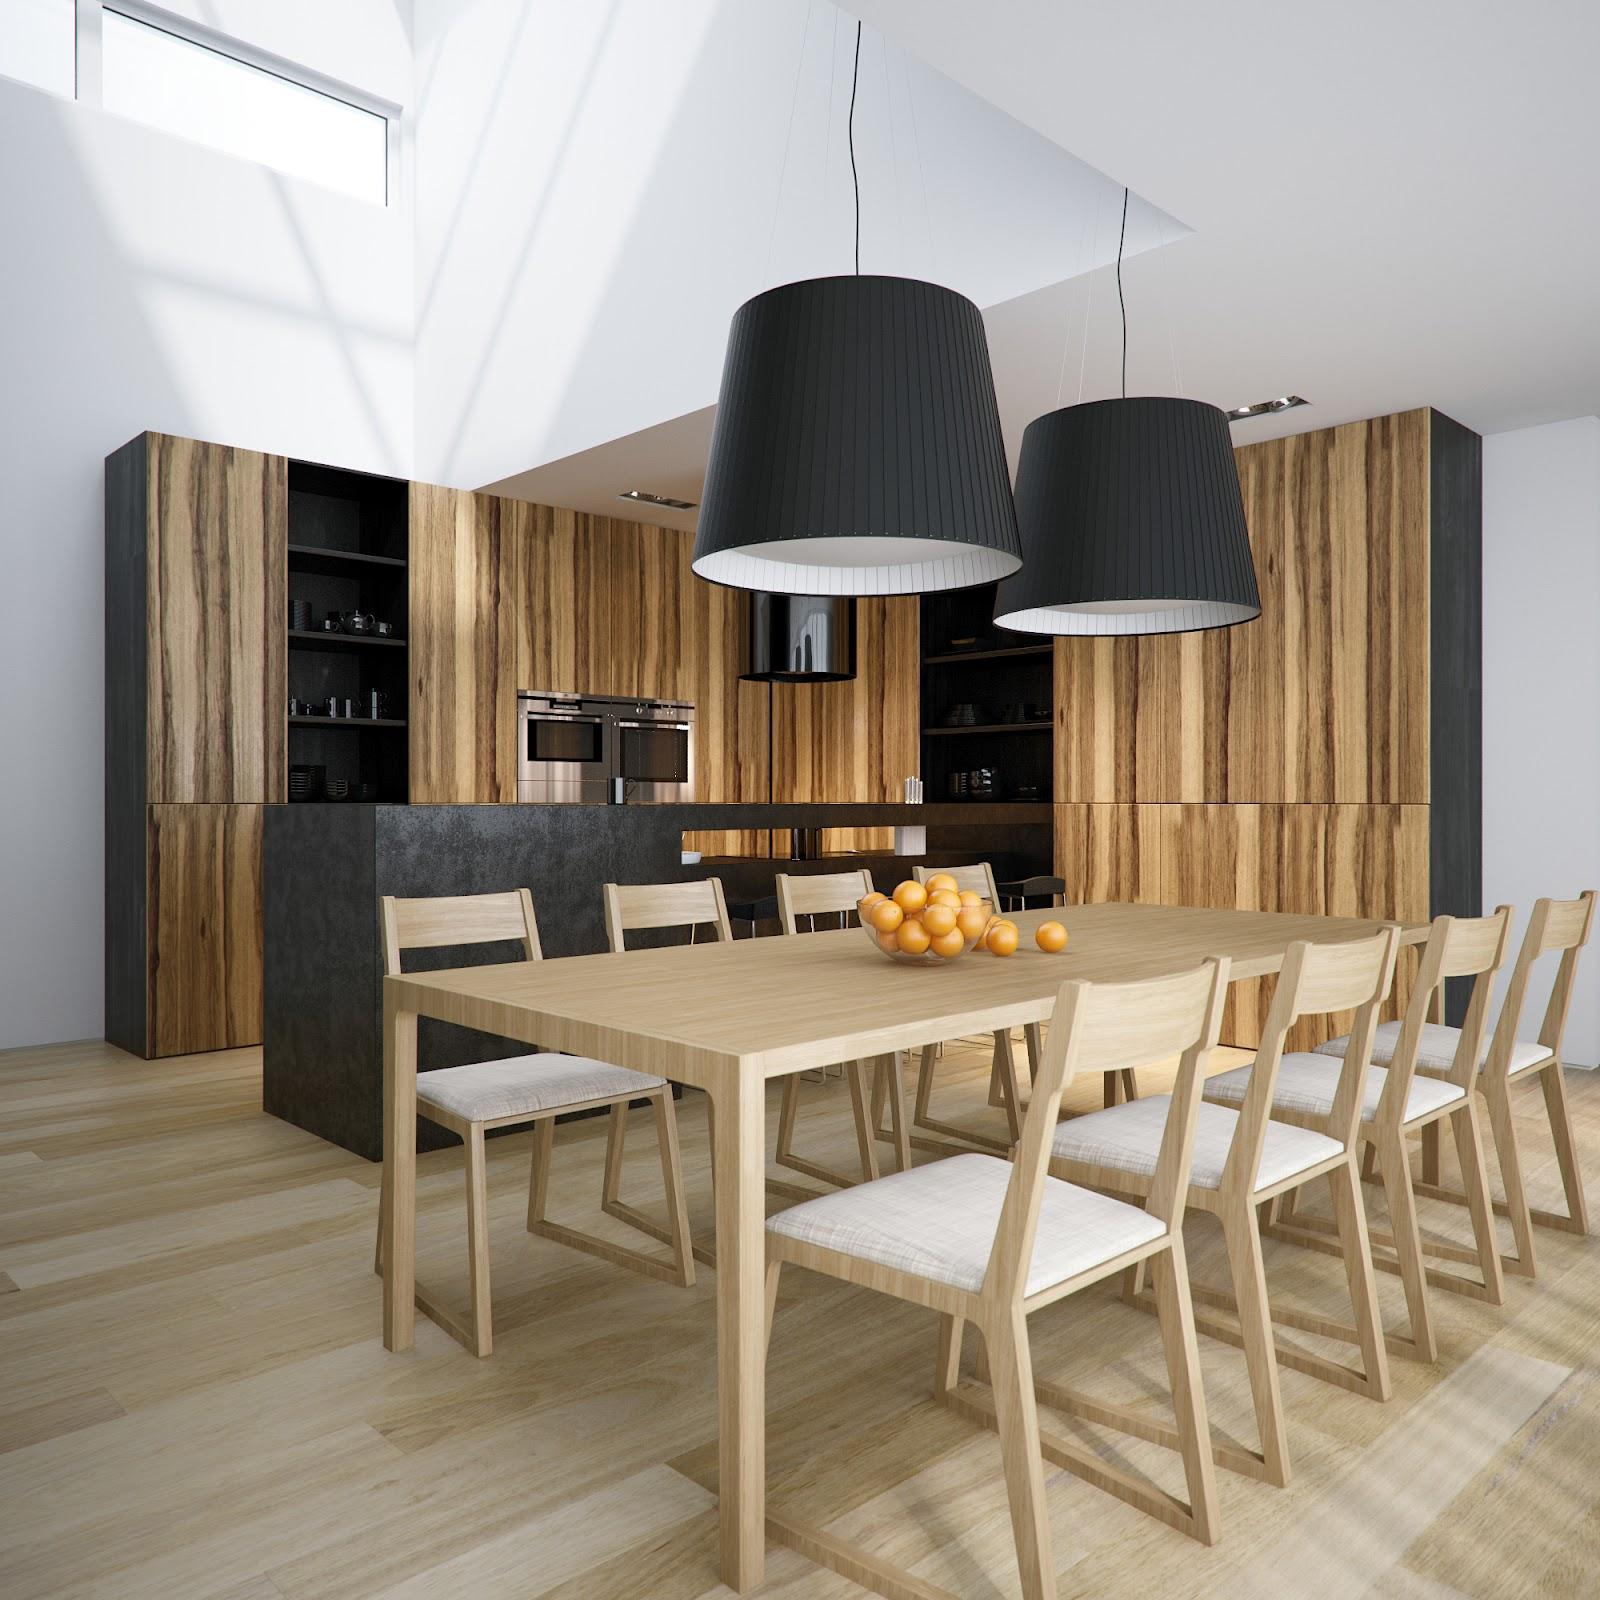 Lampu Ruang Makan Sederhana